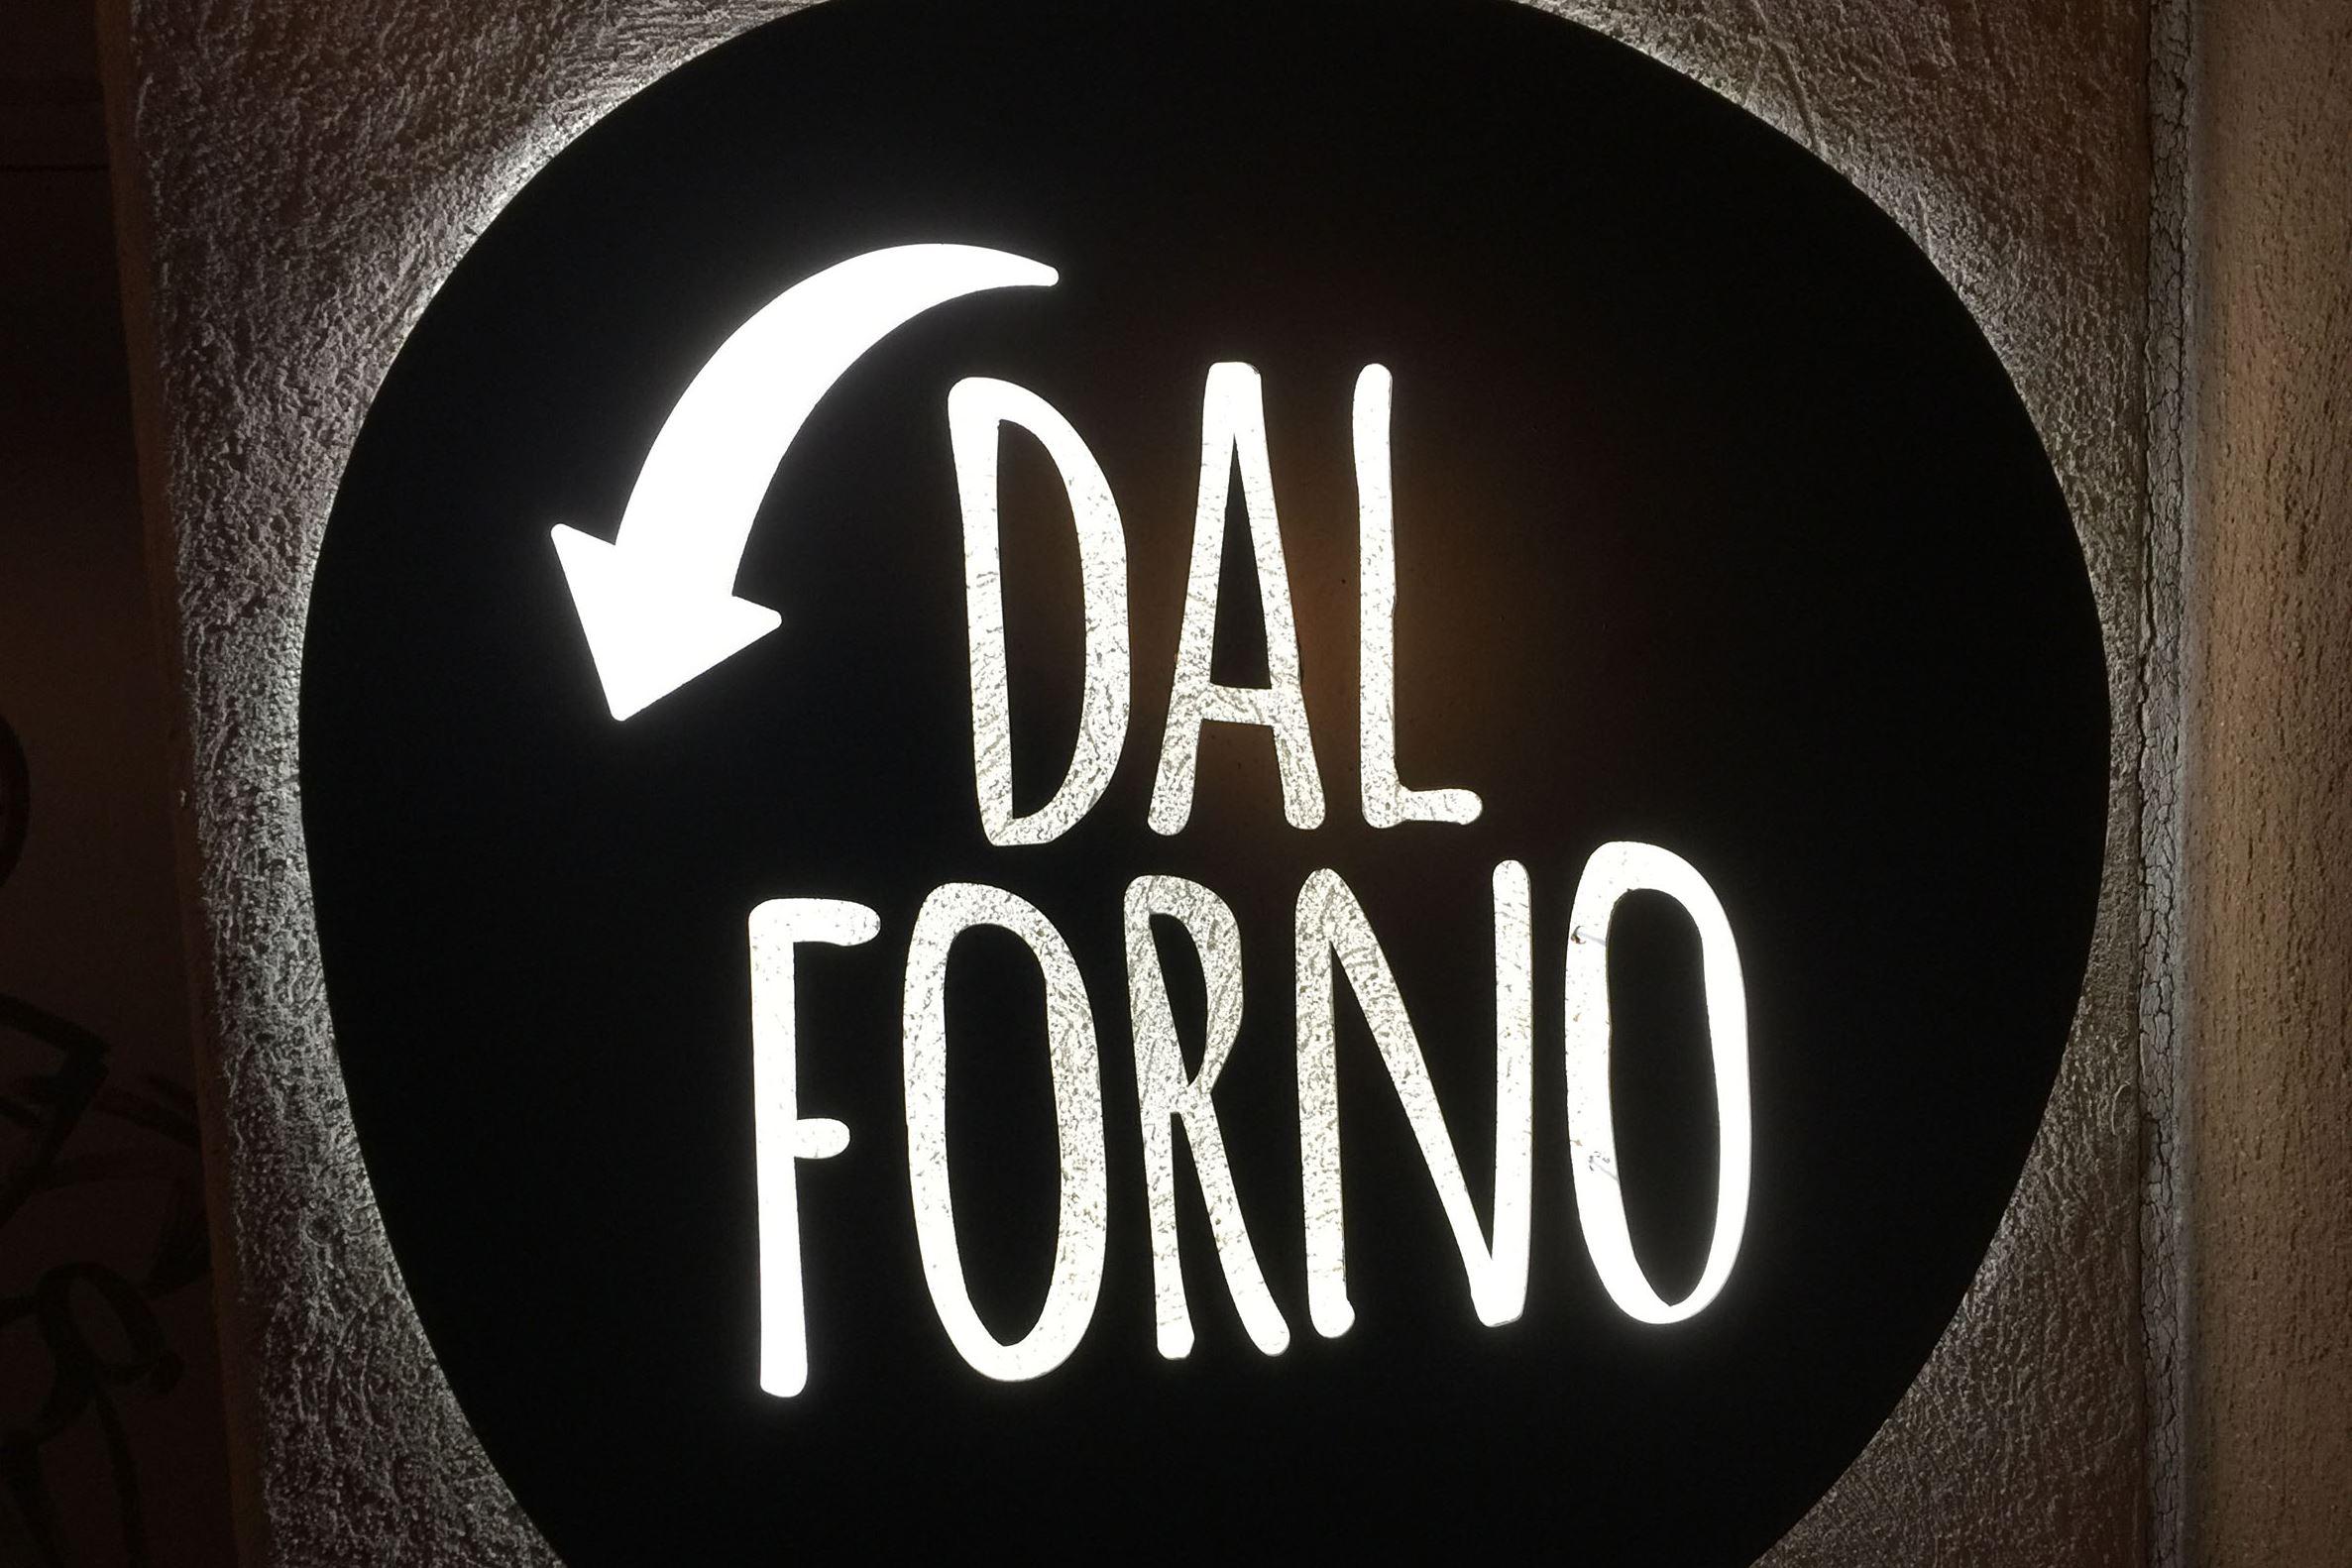 munch dal forno 06-6 An exterior sign at Dal Forno in North Huntington.